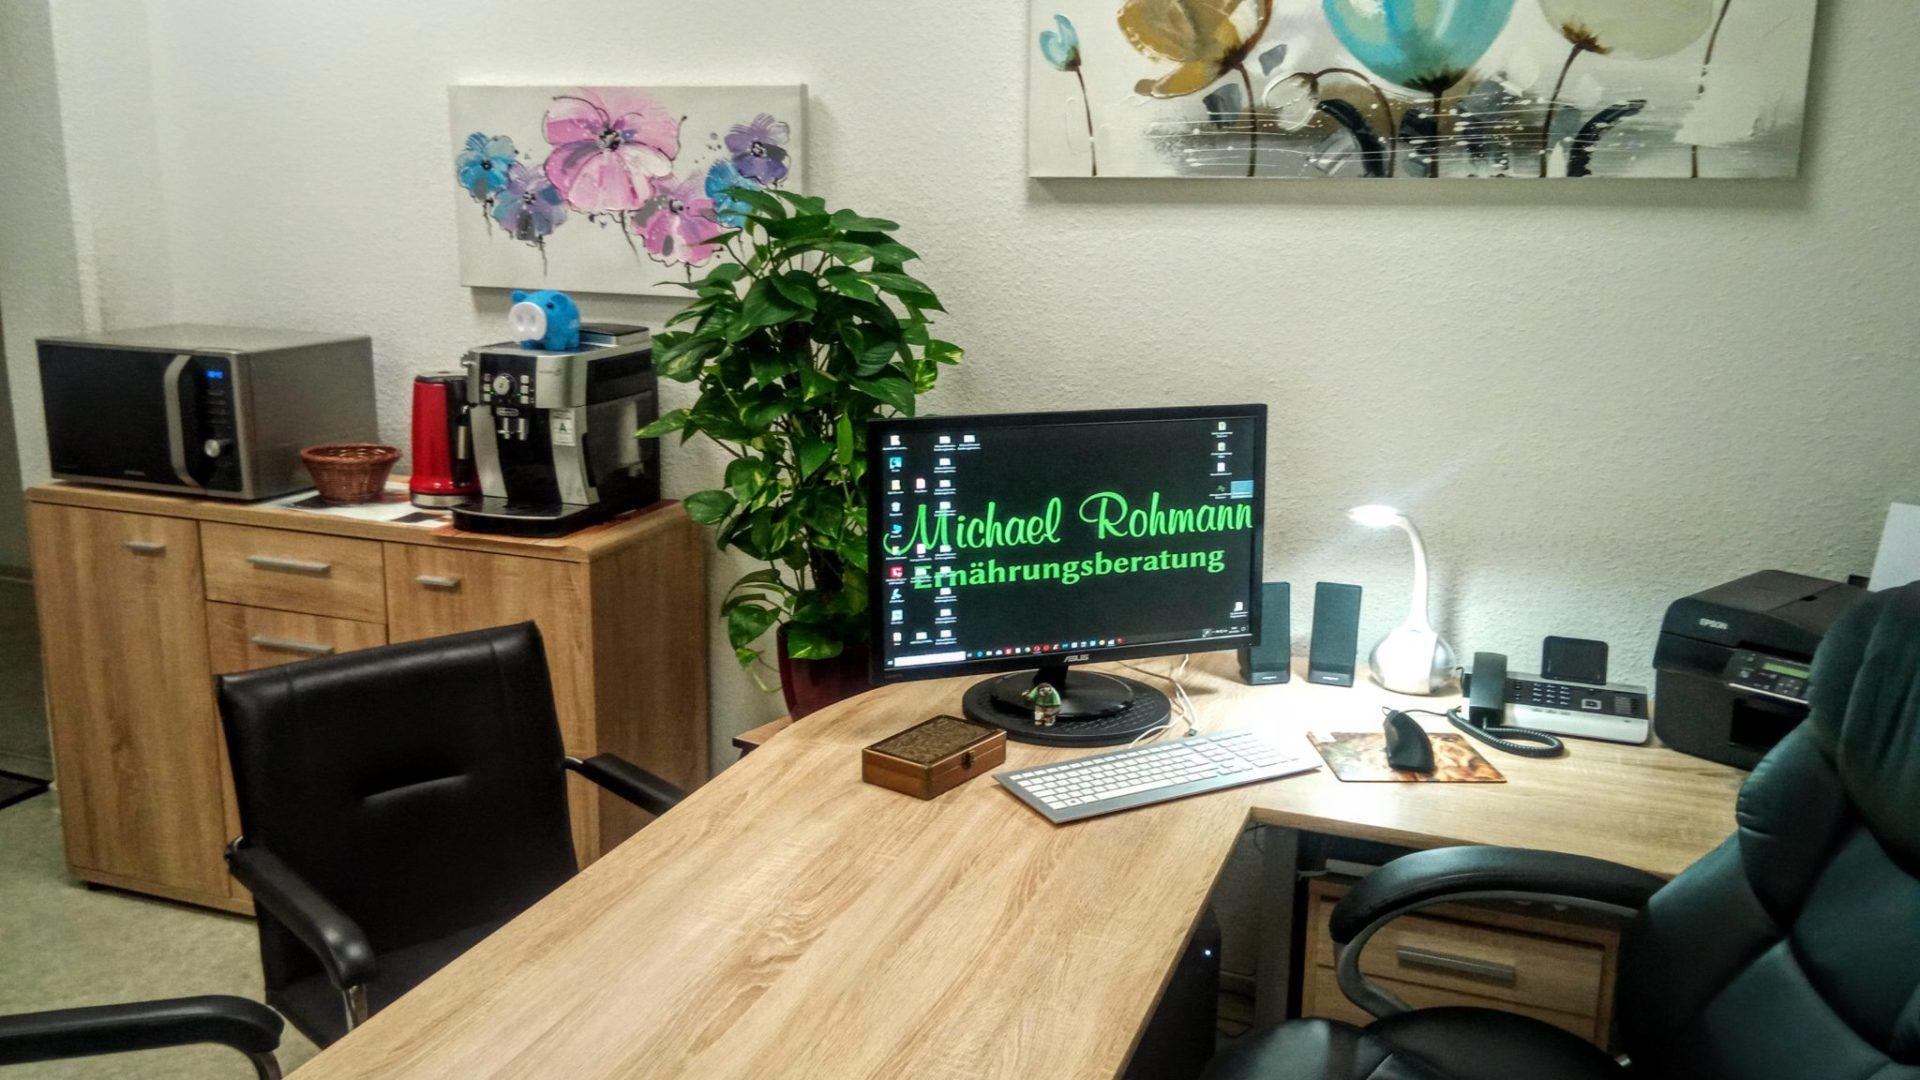 Michael Rohmann Ernährungsberatung